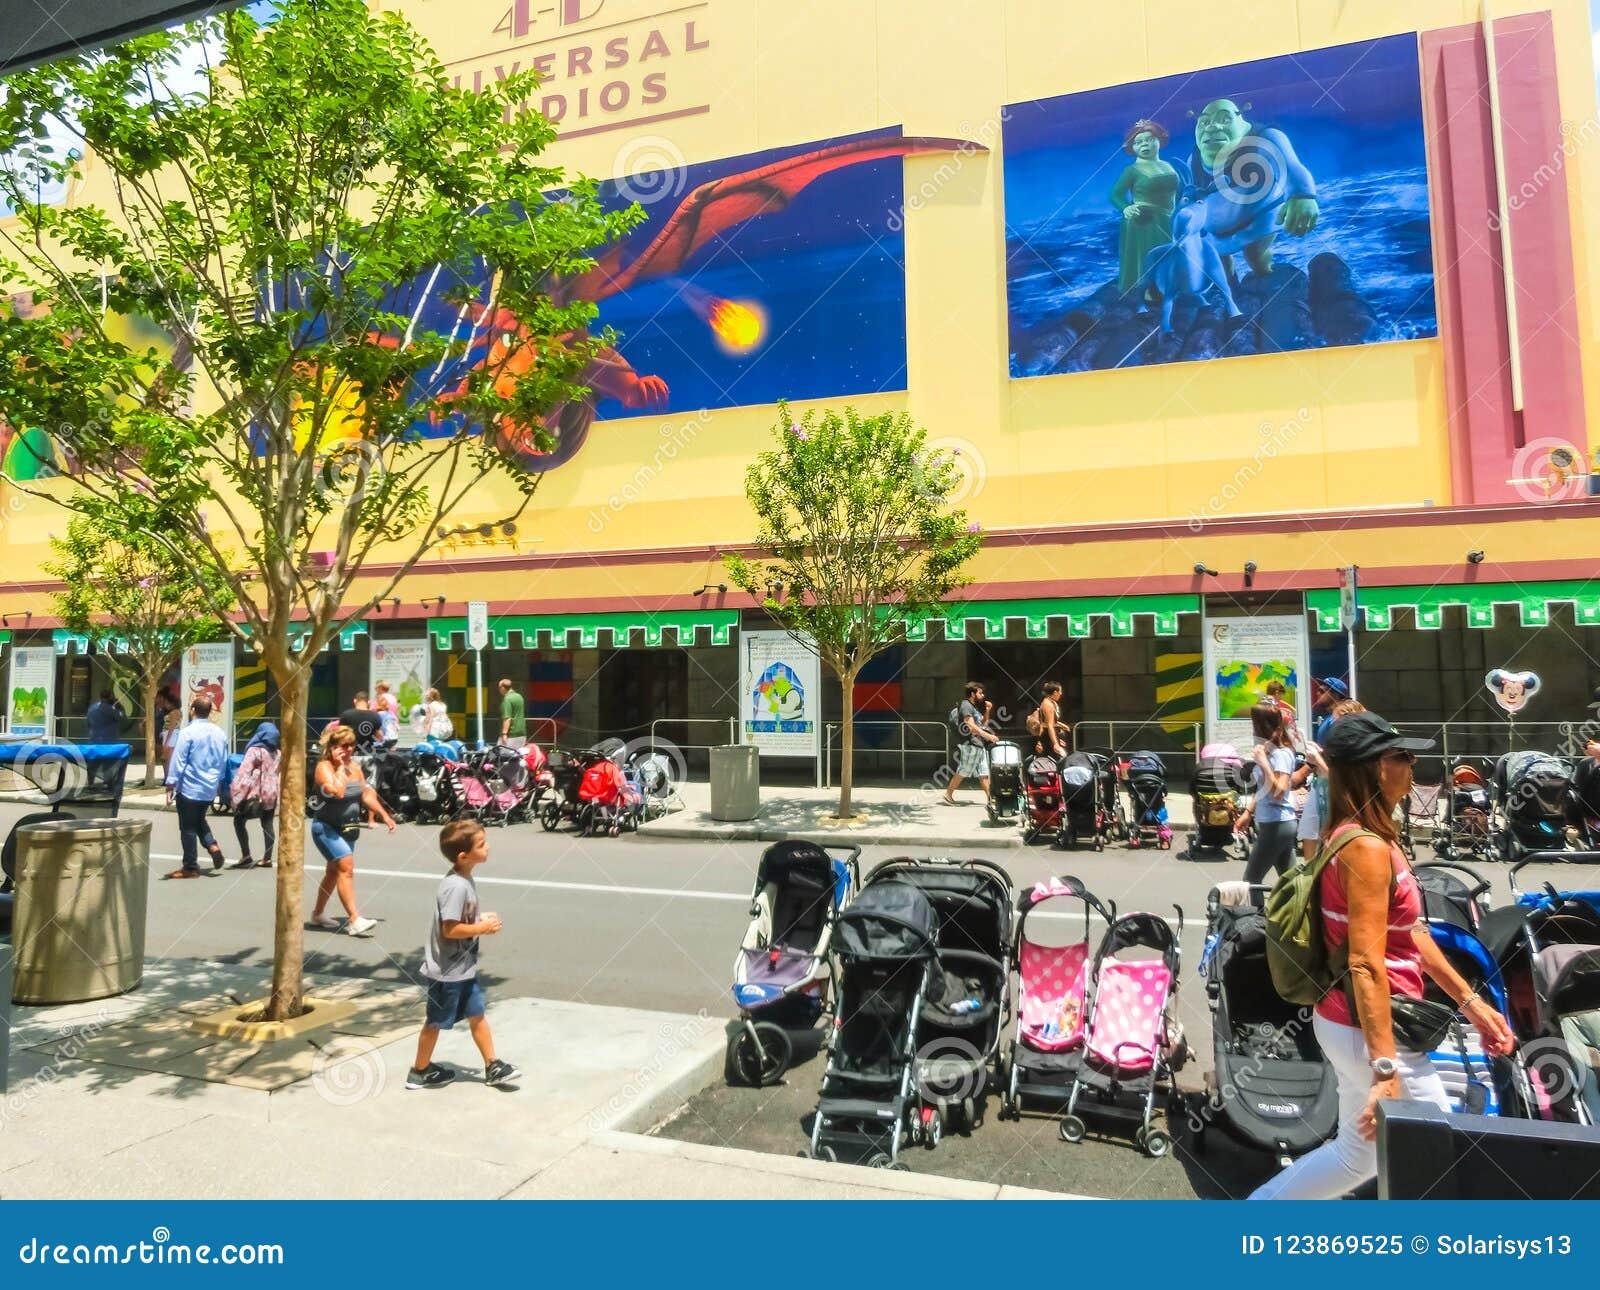 Shrek 4-d film in universal studios florida, fl, usa editorial.